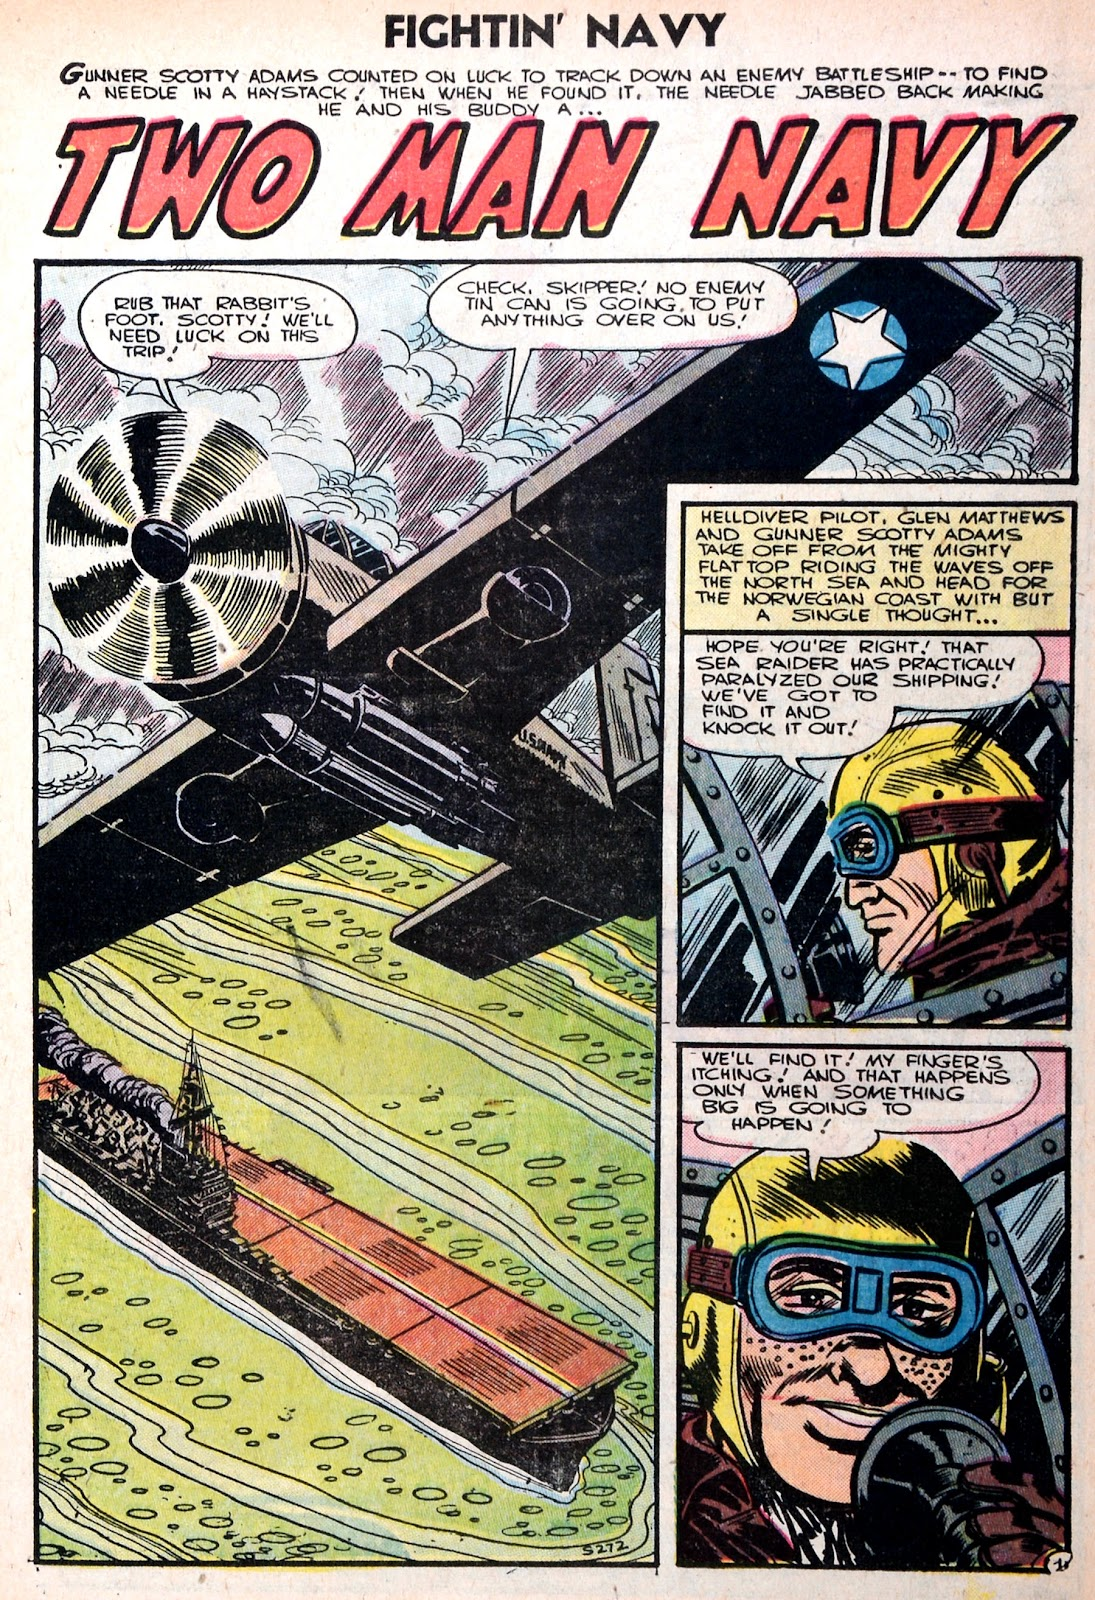 Read online Fightin' Navy comic -  Issue #75 - 3